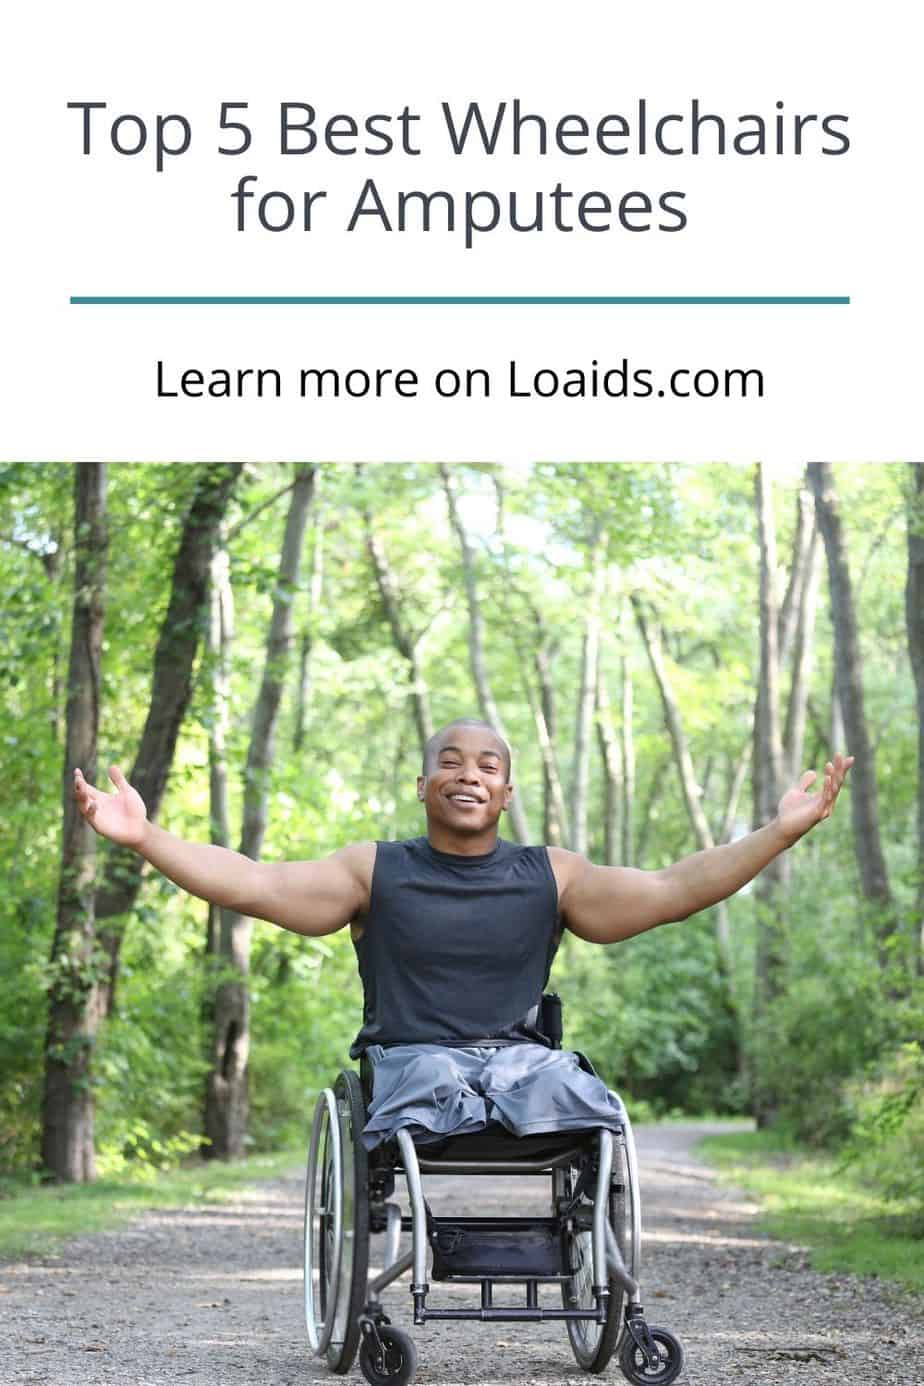 an amputee man raising his hands while in a wheelchair